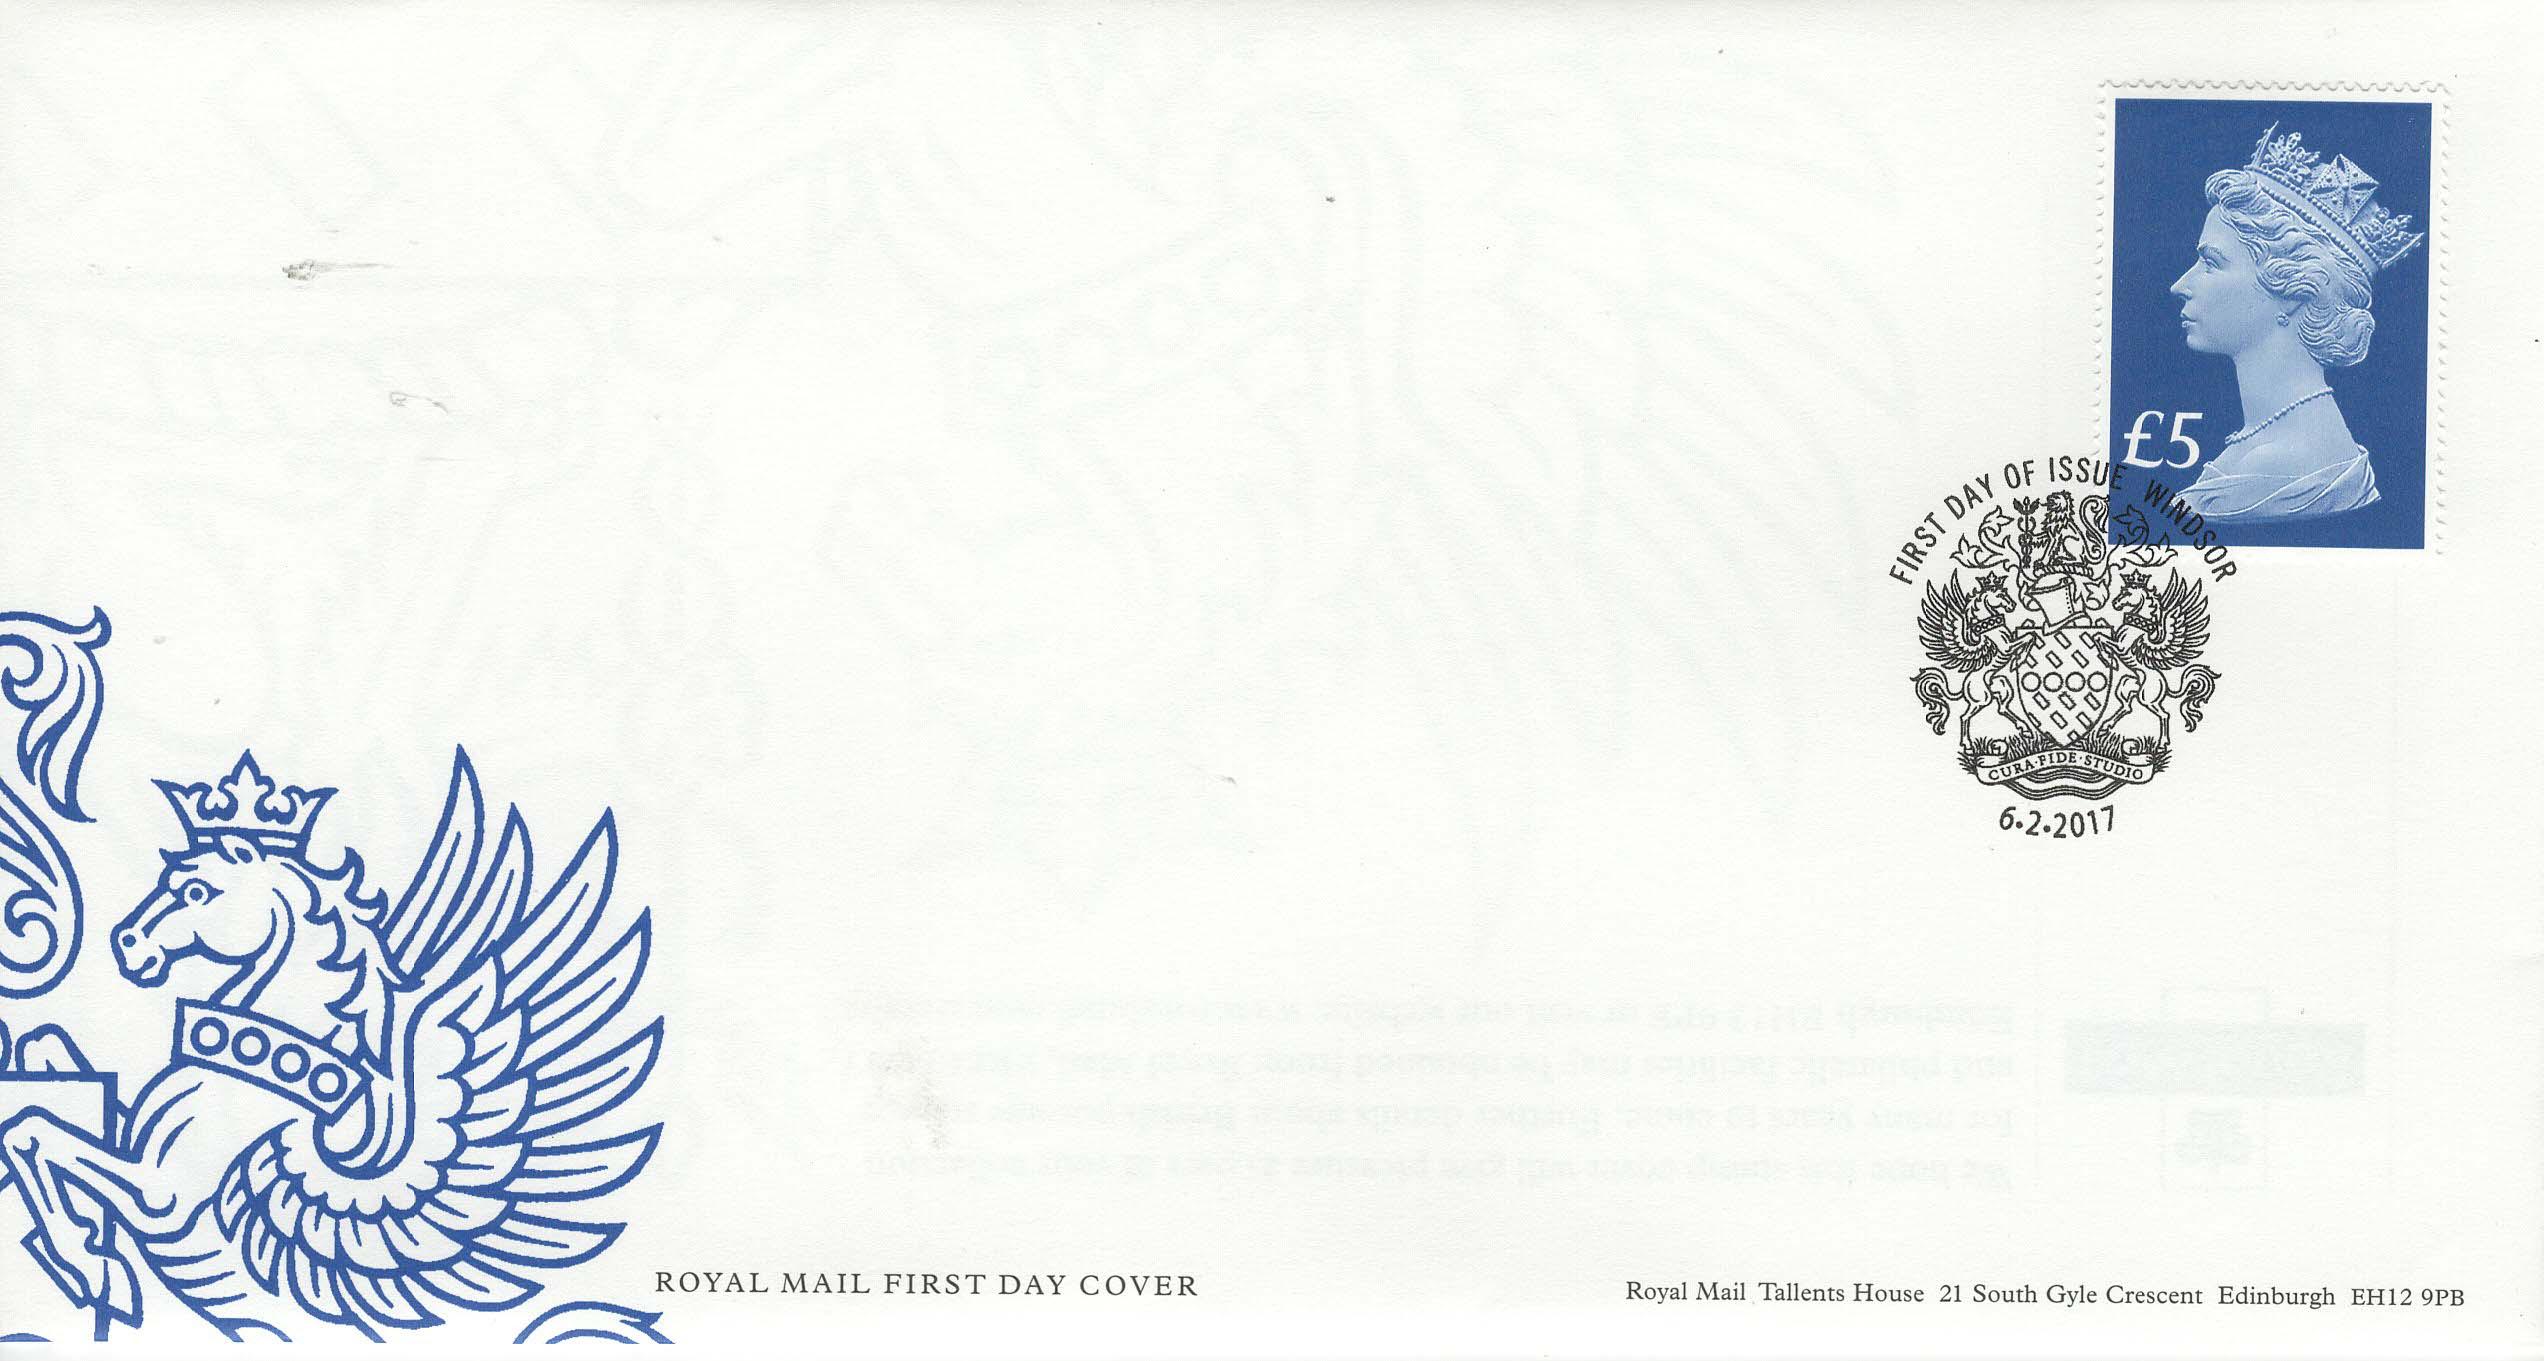 RM-High-Value-£5-Definitive-FDC-Feb-2017